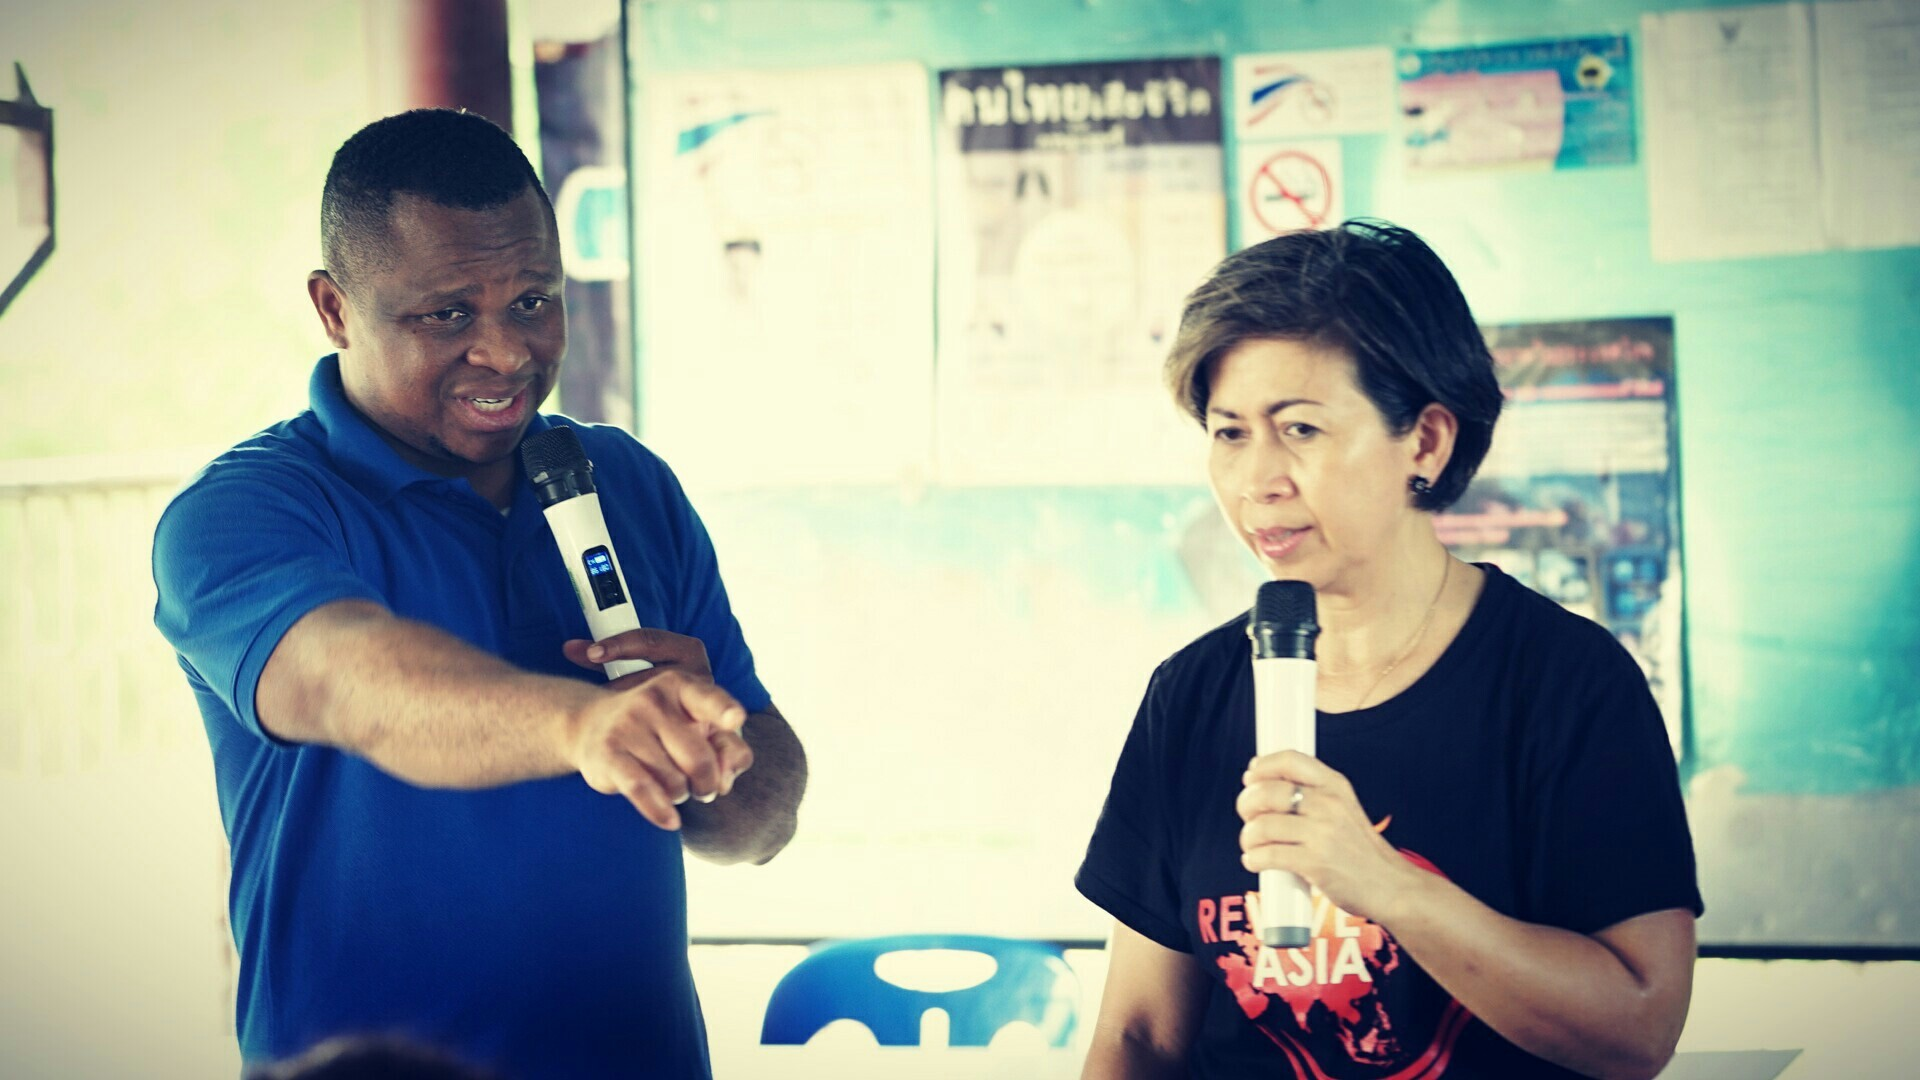 THAILAND MISSIONS TRIP PHOTOS & VIDEOS 330